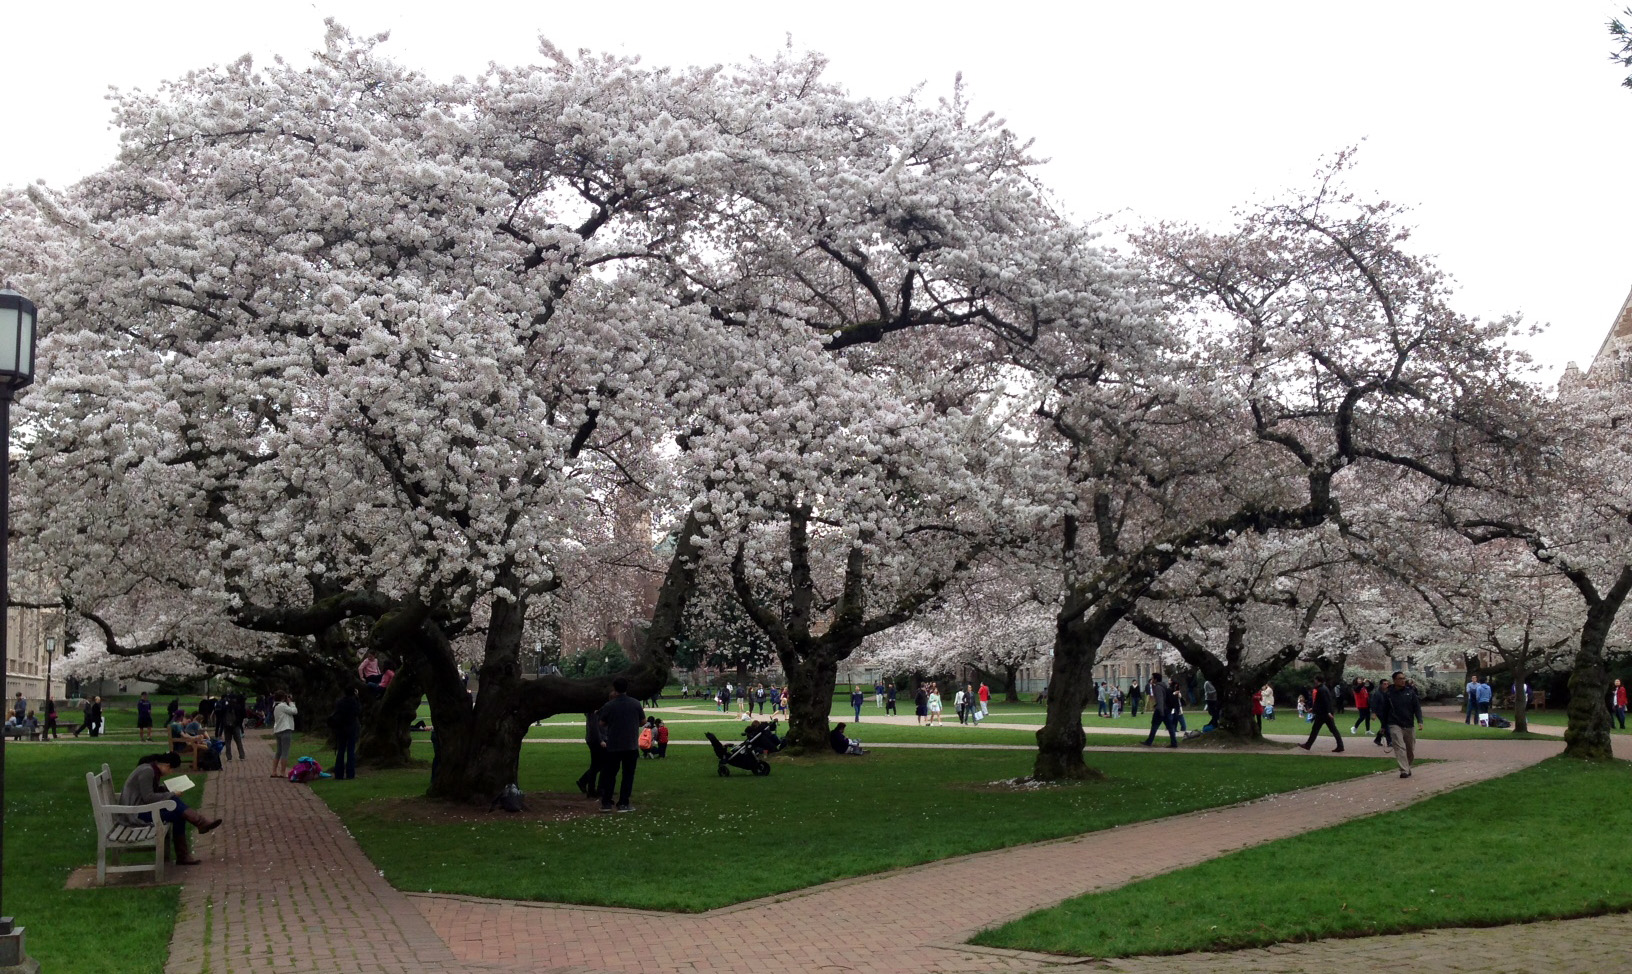 2015 Uw Cherry Tree Watch Full Bloom By March 14 Uw News